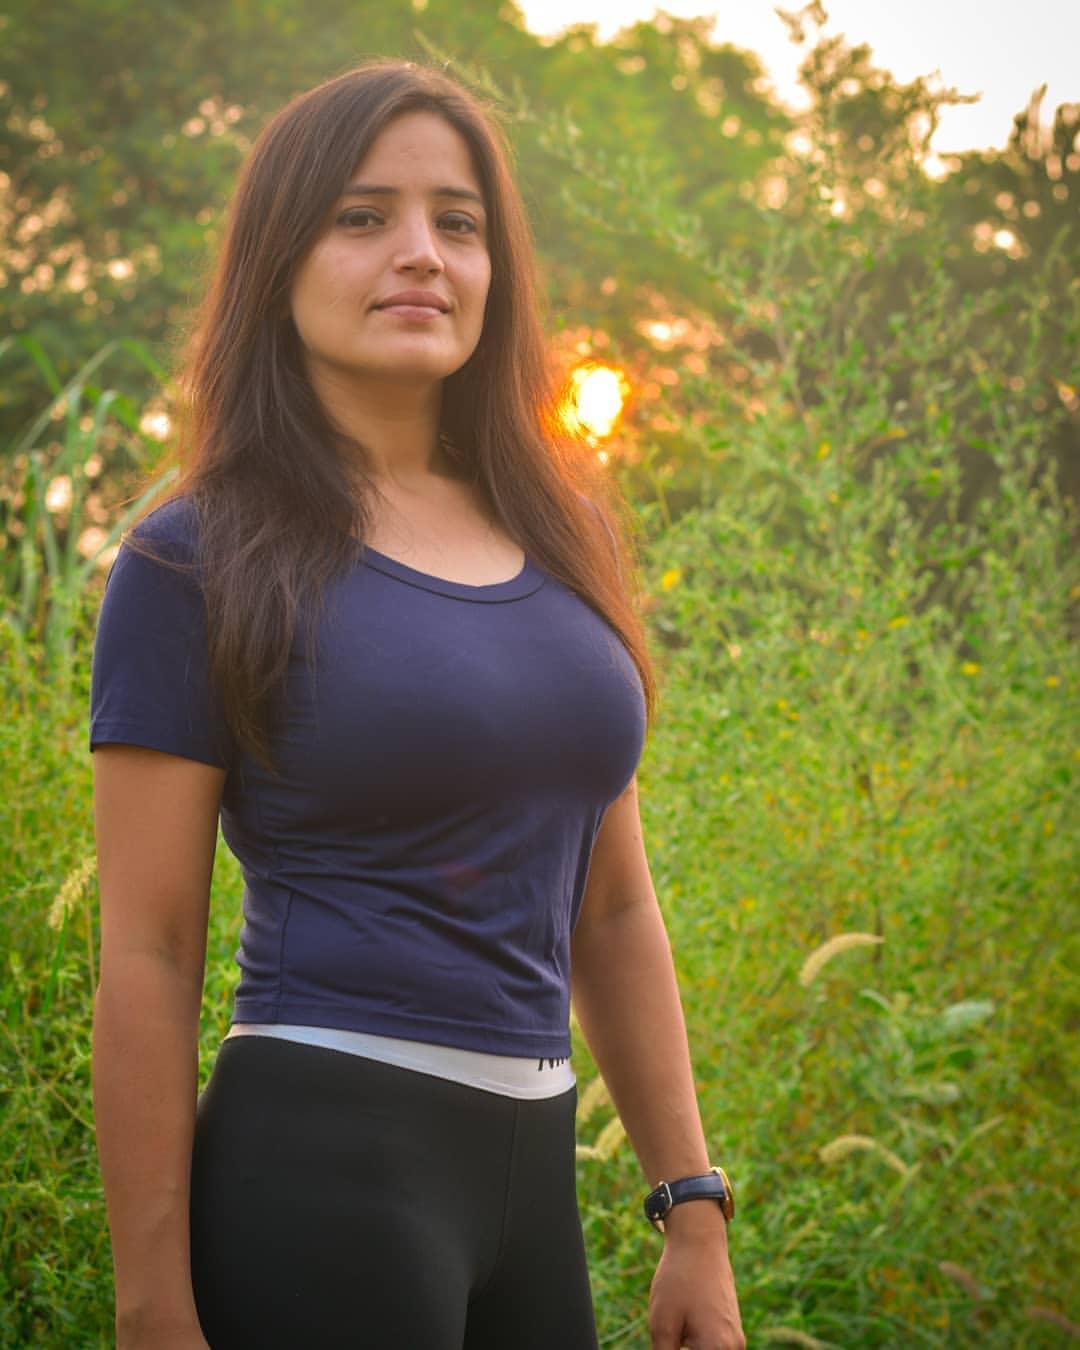 Model Reema Latest Hot Photoshoot Stills   All Indian Models